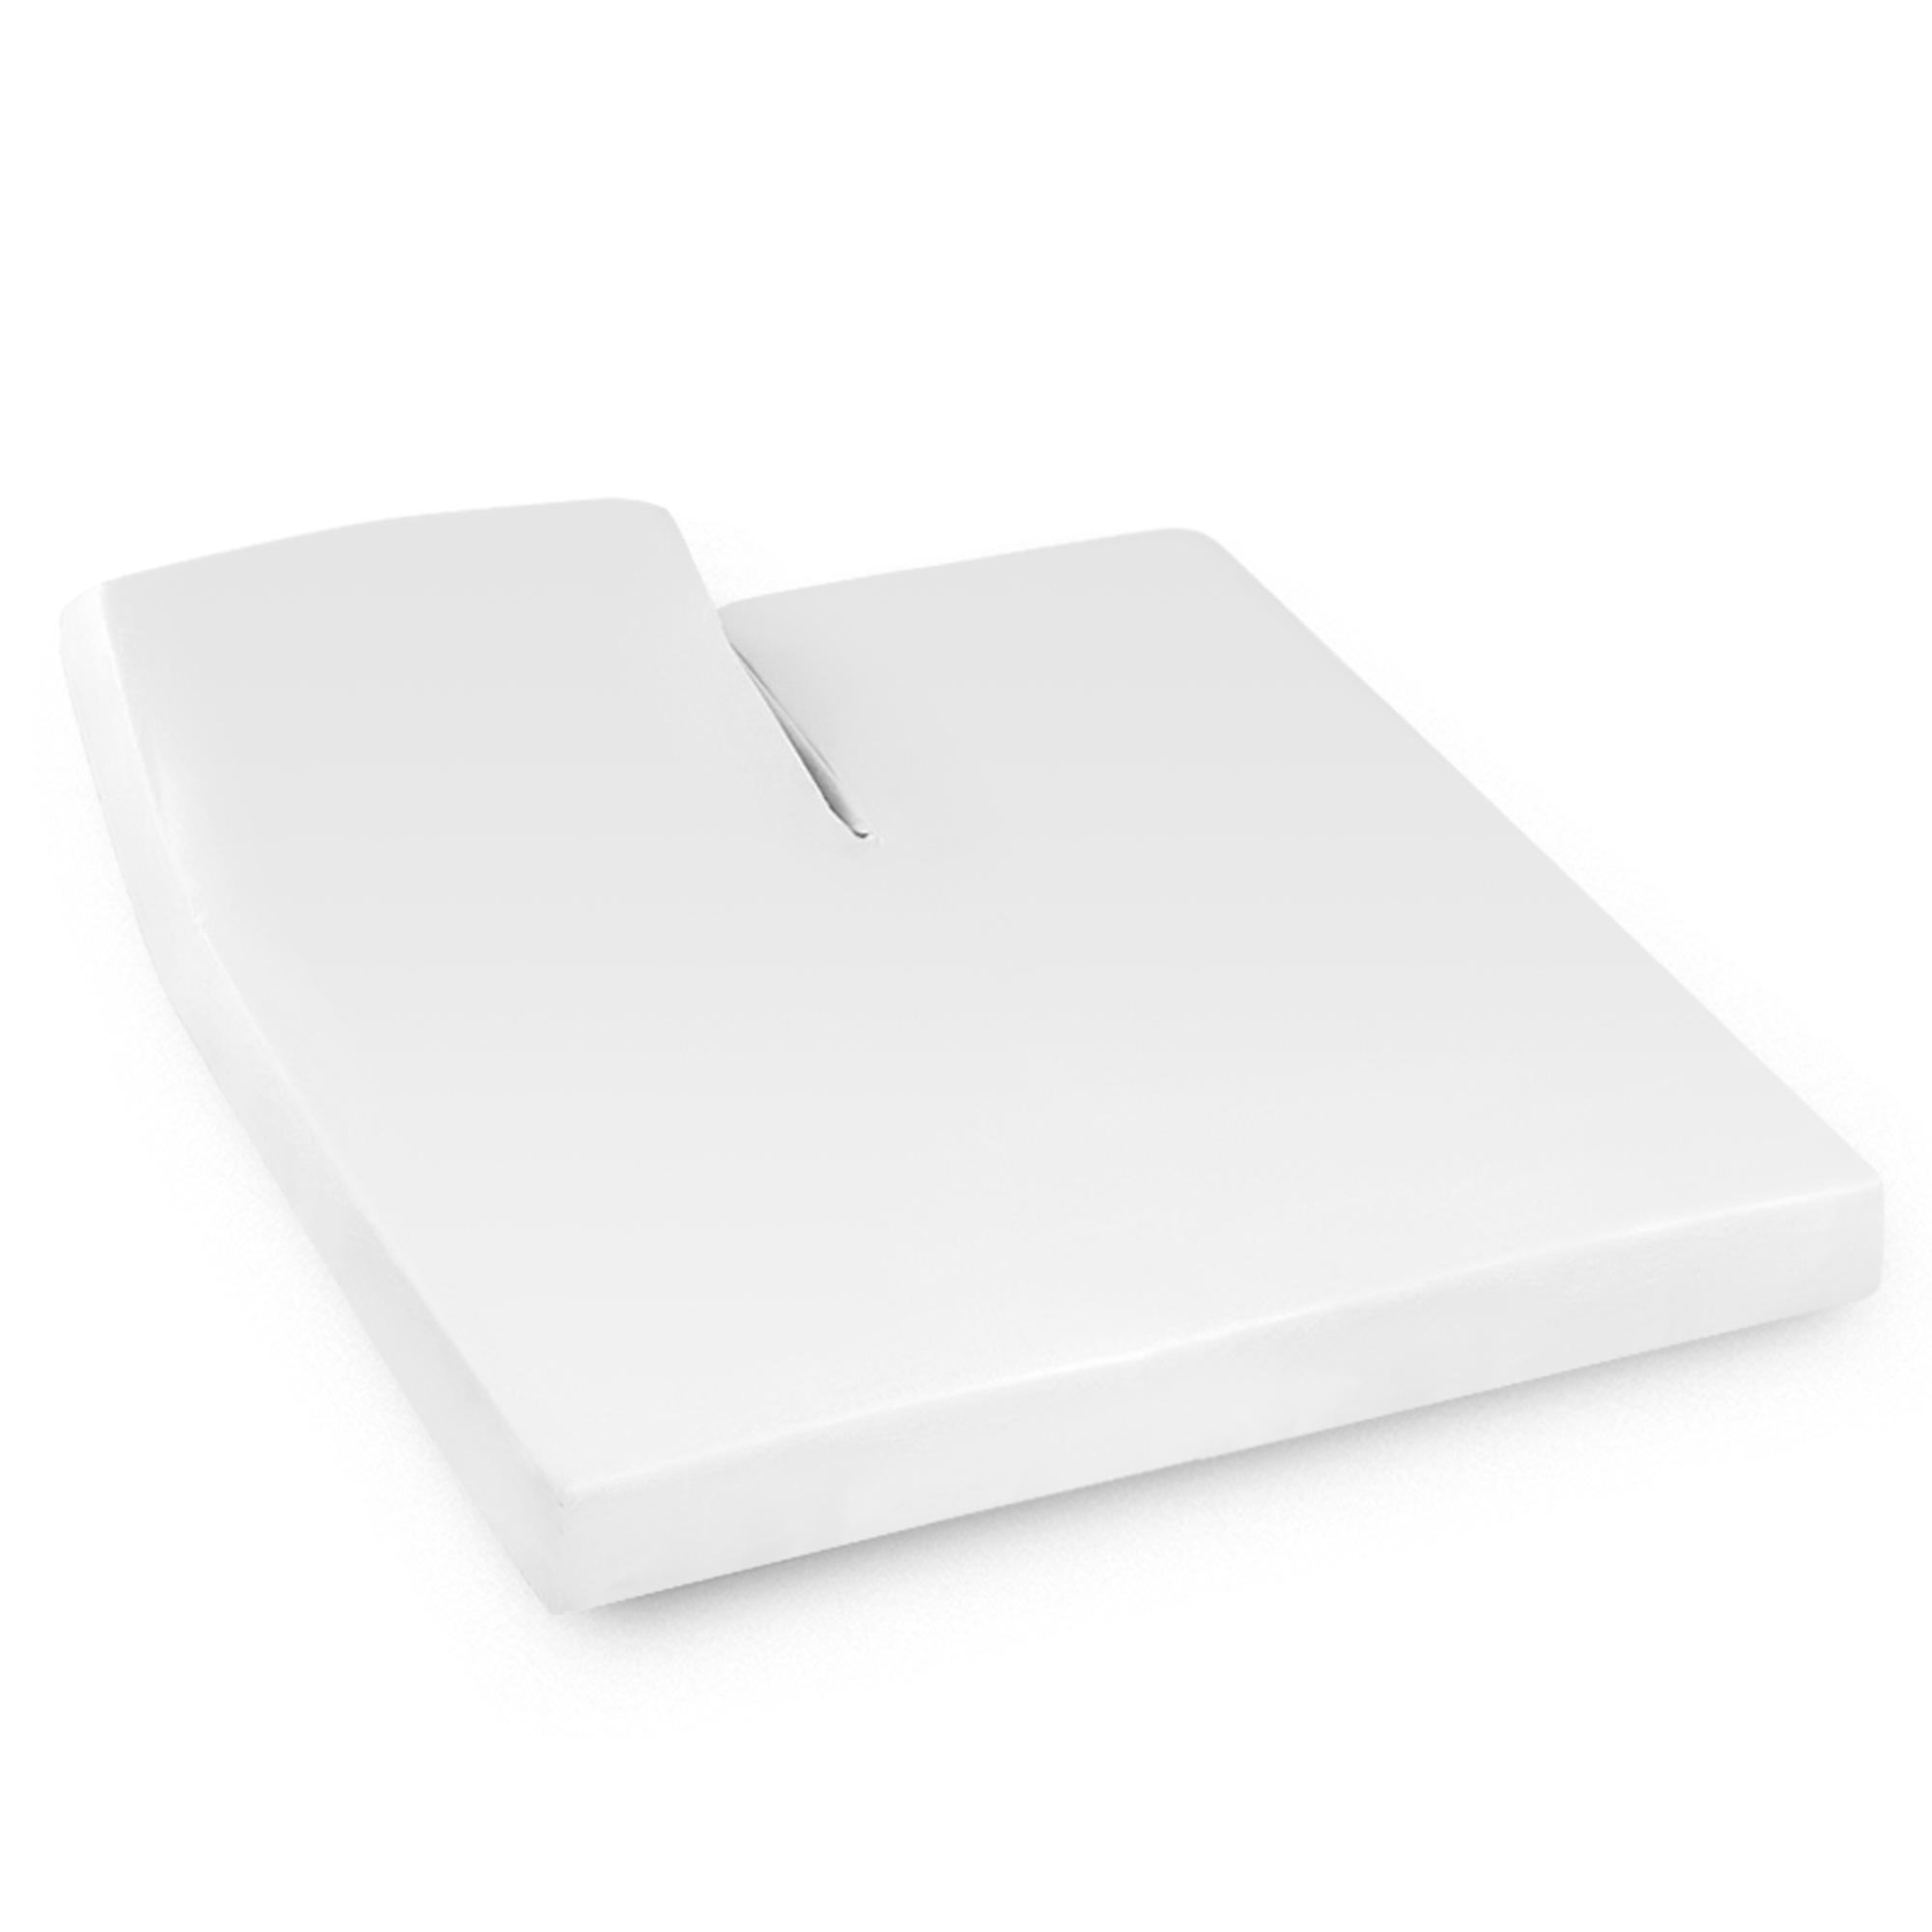 Drap Housse Relaxation 2x90x200cm Uni Pur Coton Alto Blanc Tr T Te